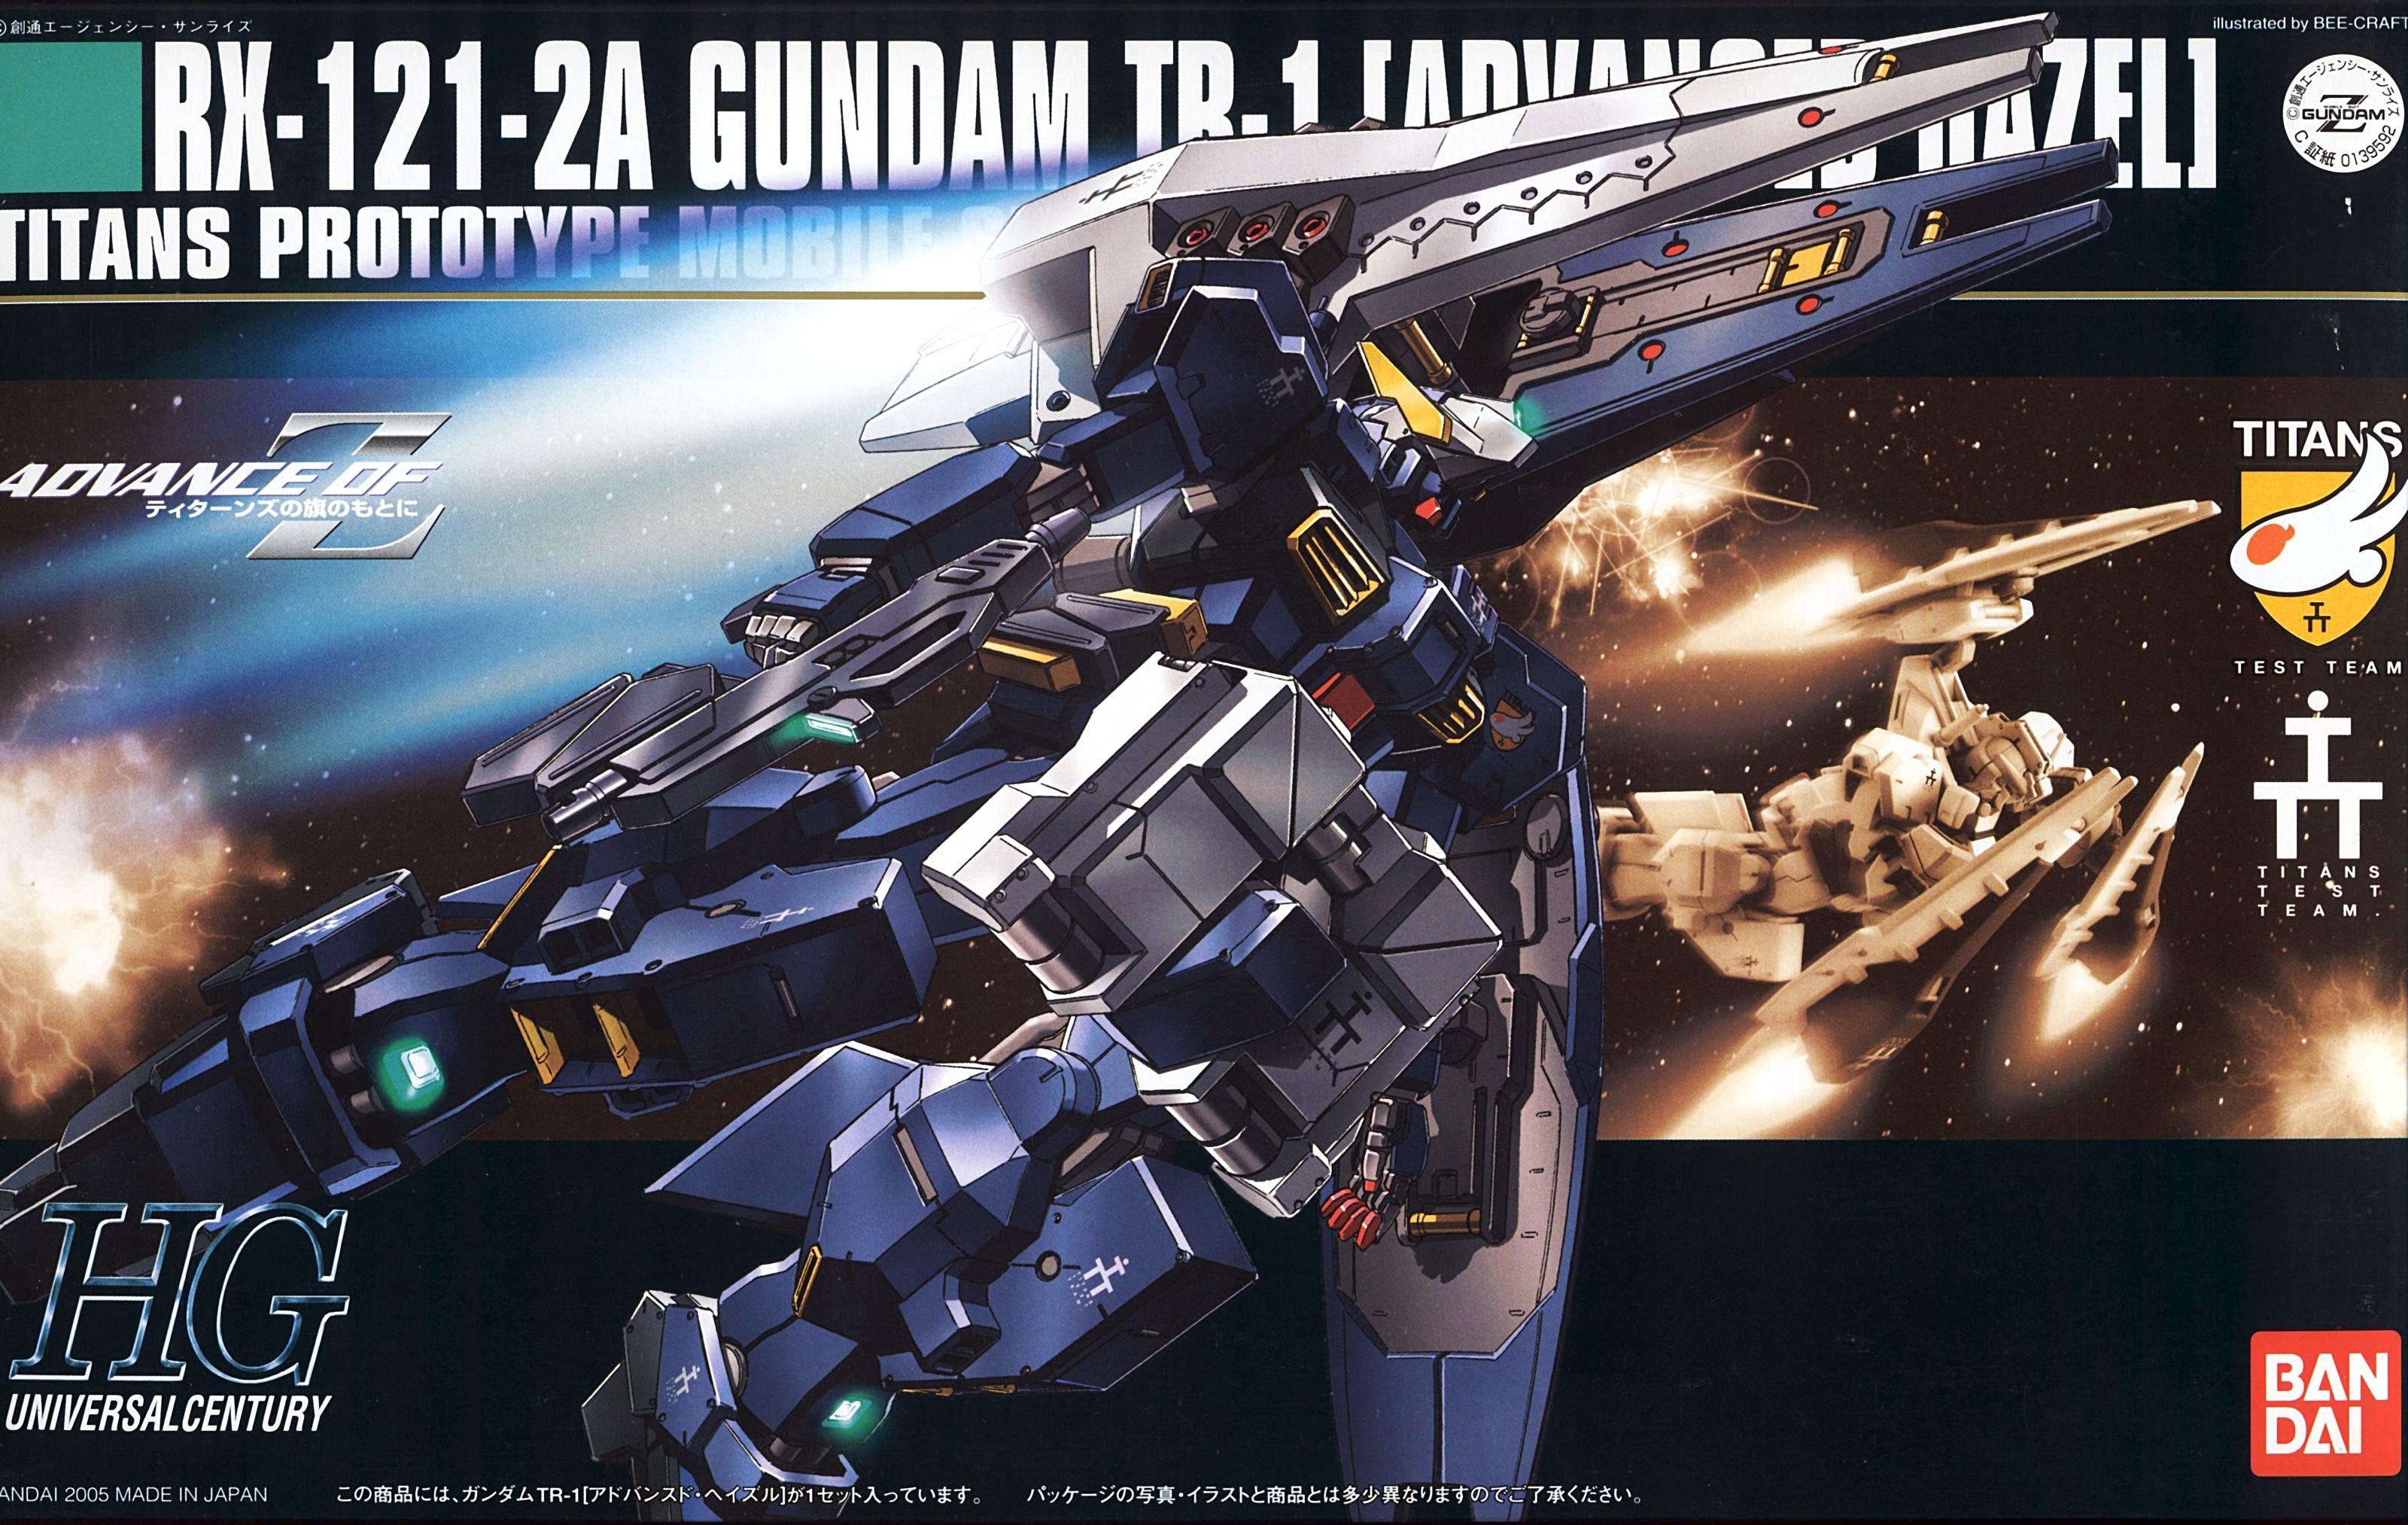 HGUC 1/144 GUNDAM TR-1 [ADVANCED HAZEL] กันดั้ม แอดวานซ์ ฮาเซล